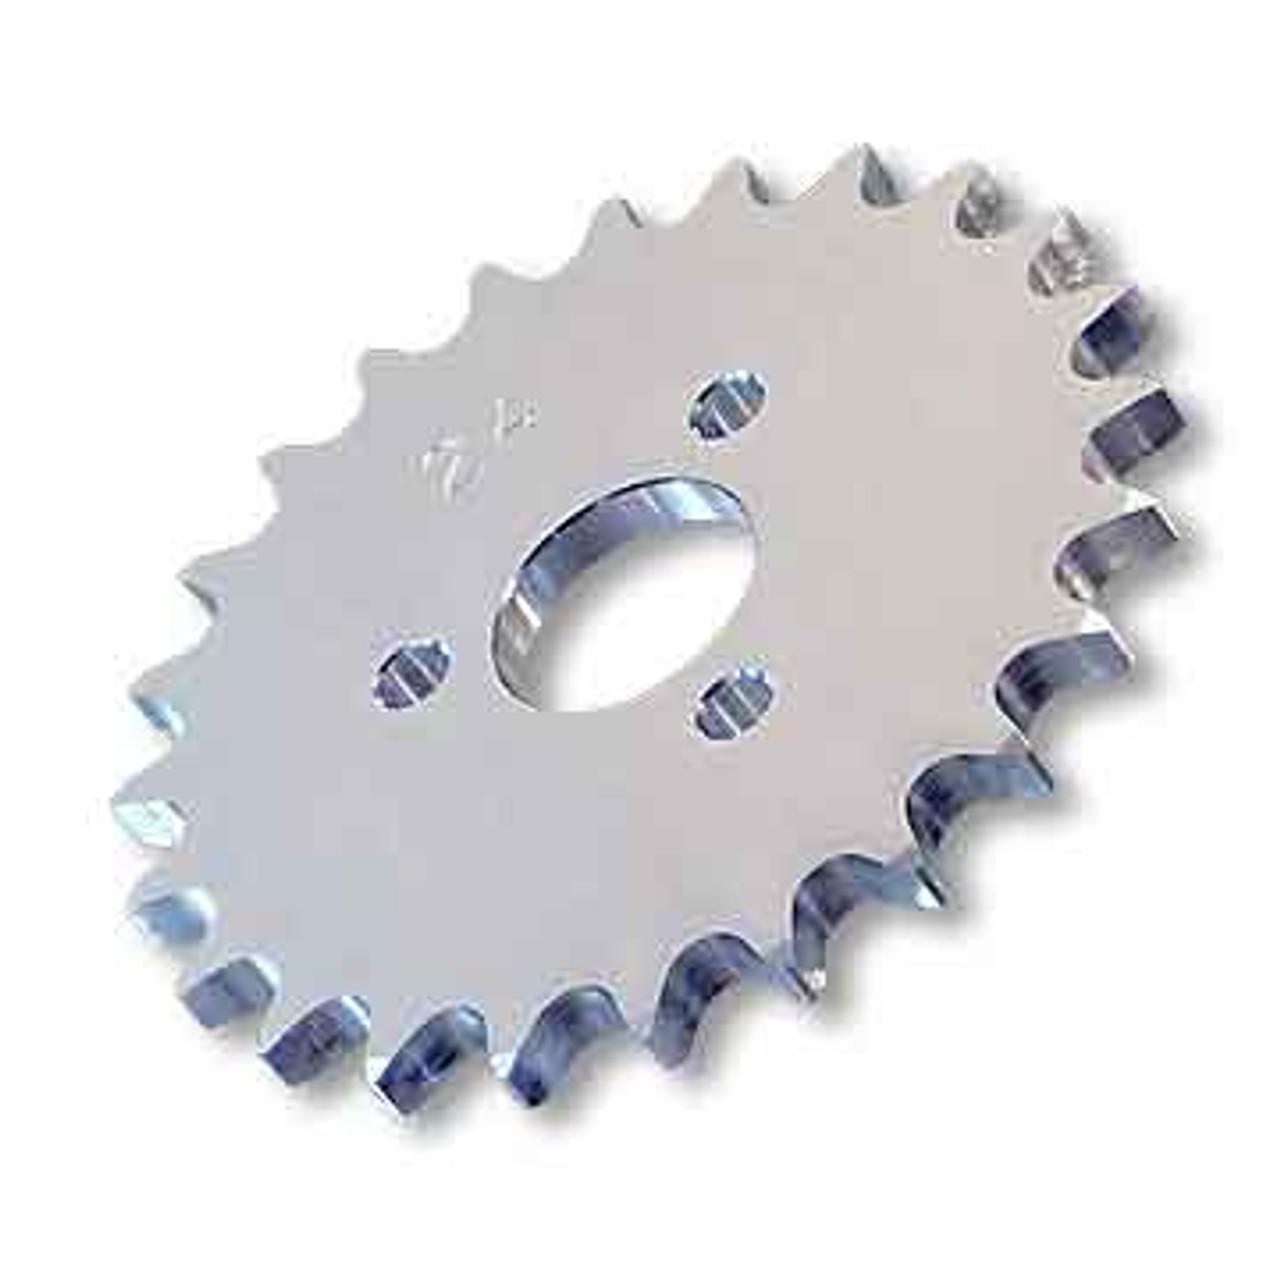 "33 Tooth Engine Sprocket, Aluminum, 40 Chain 1"" Bore, 1.680"" Bolt Circle"